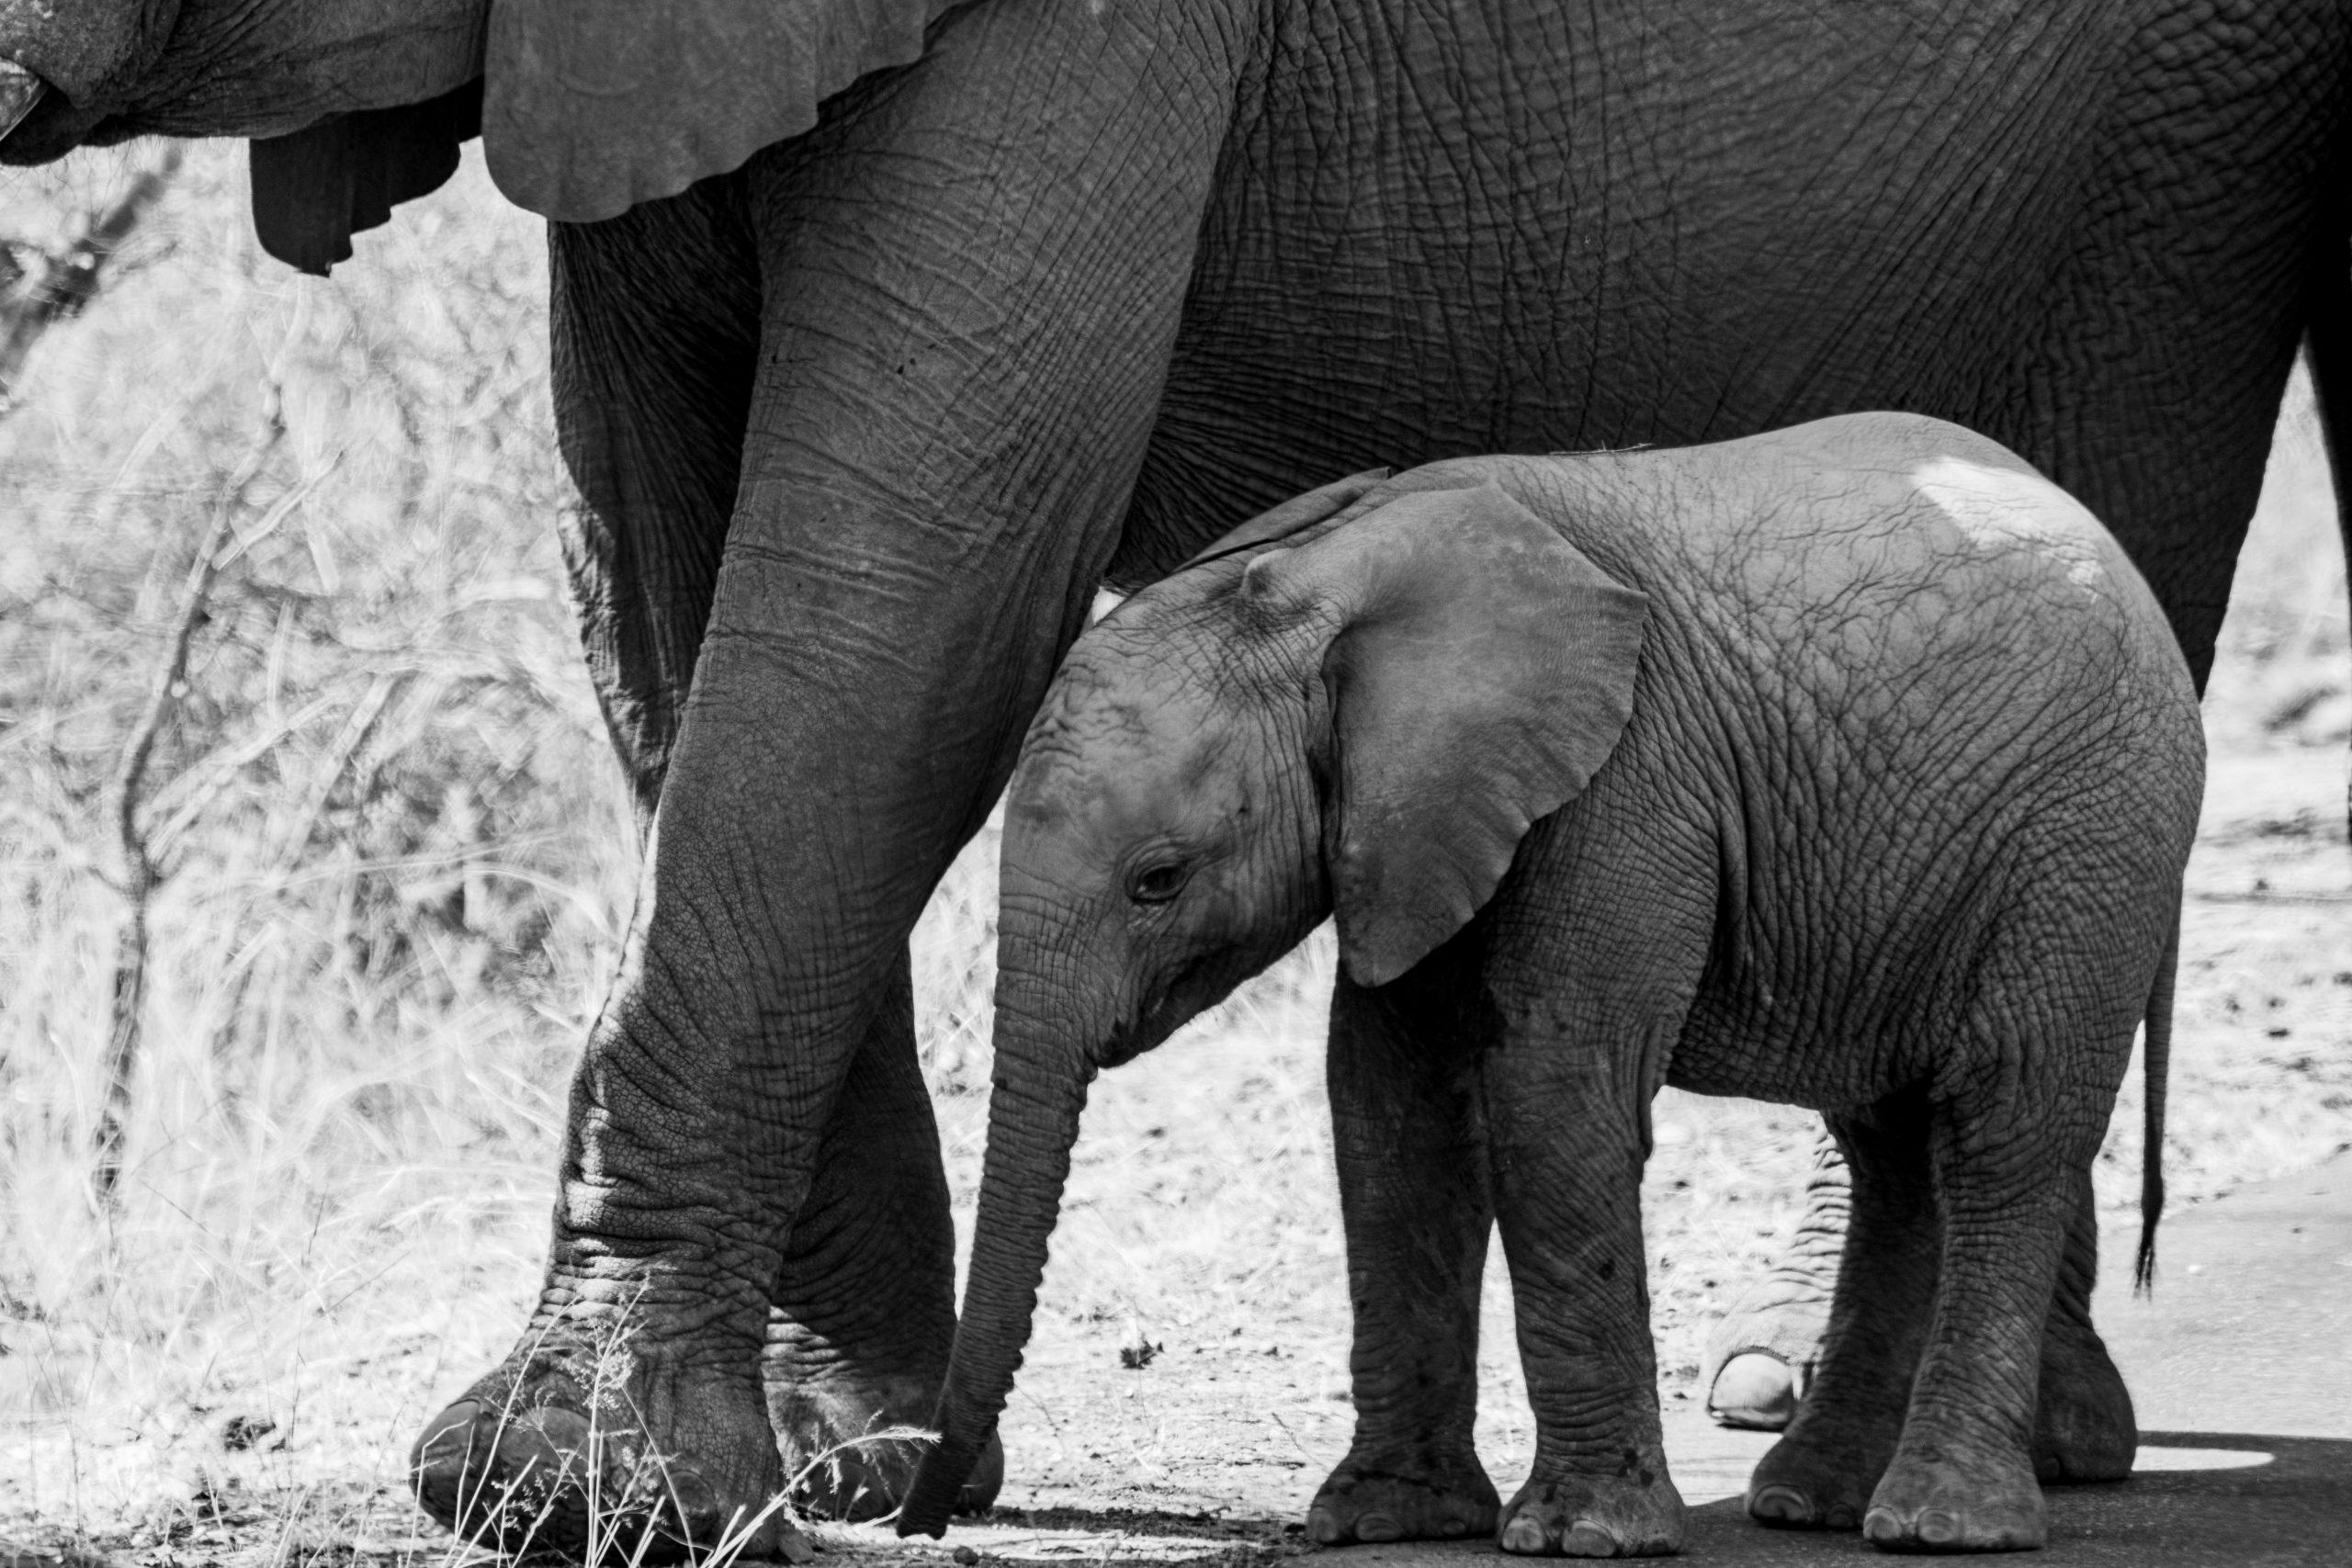 Baby Elephant with mother elephant